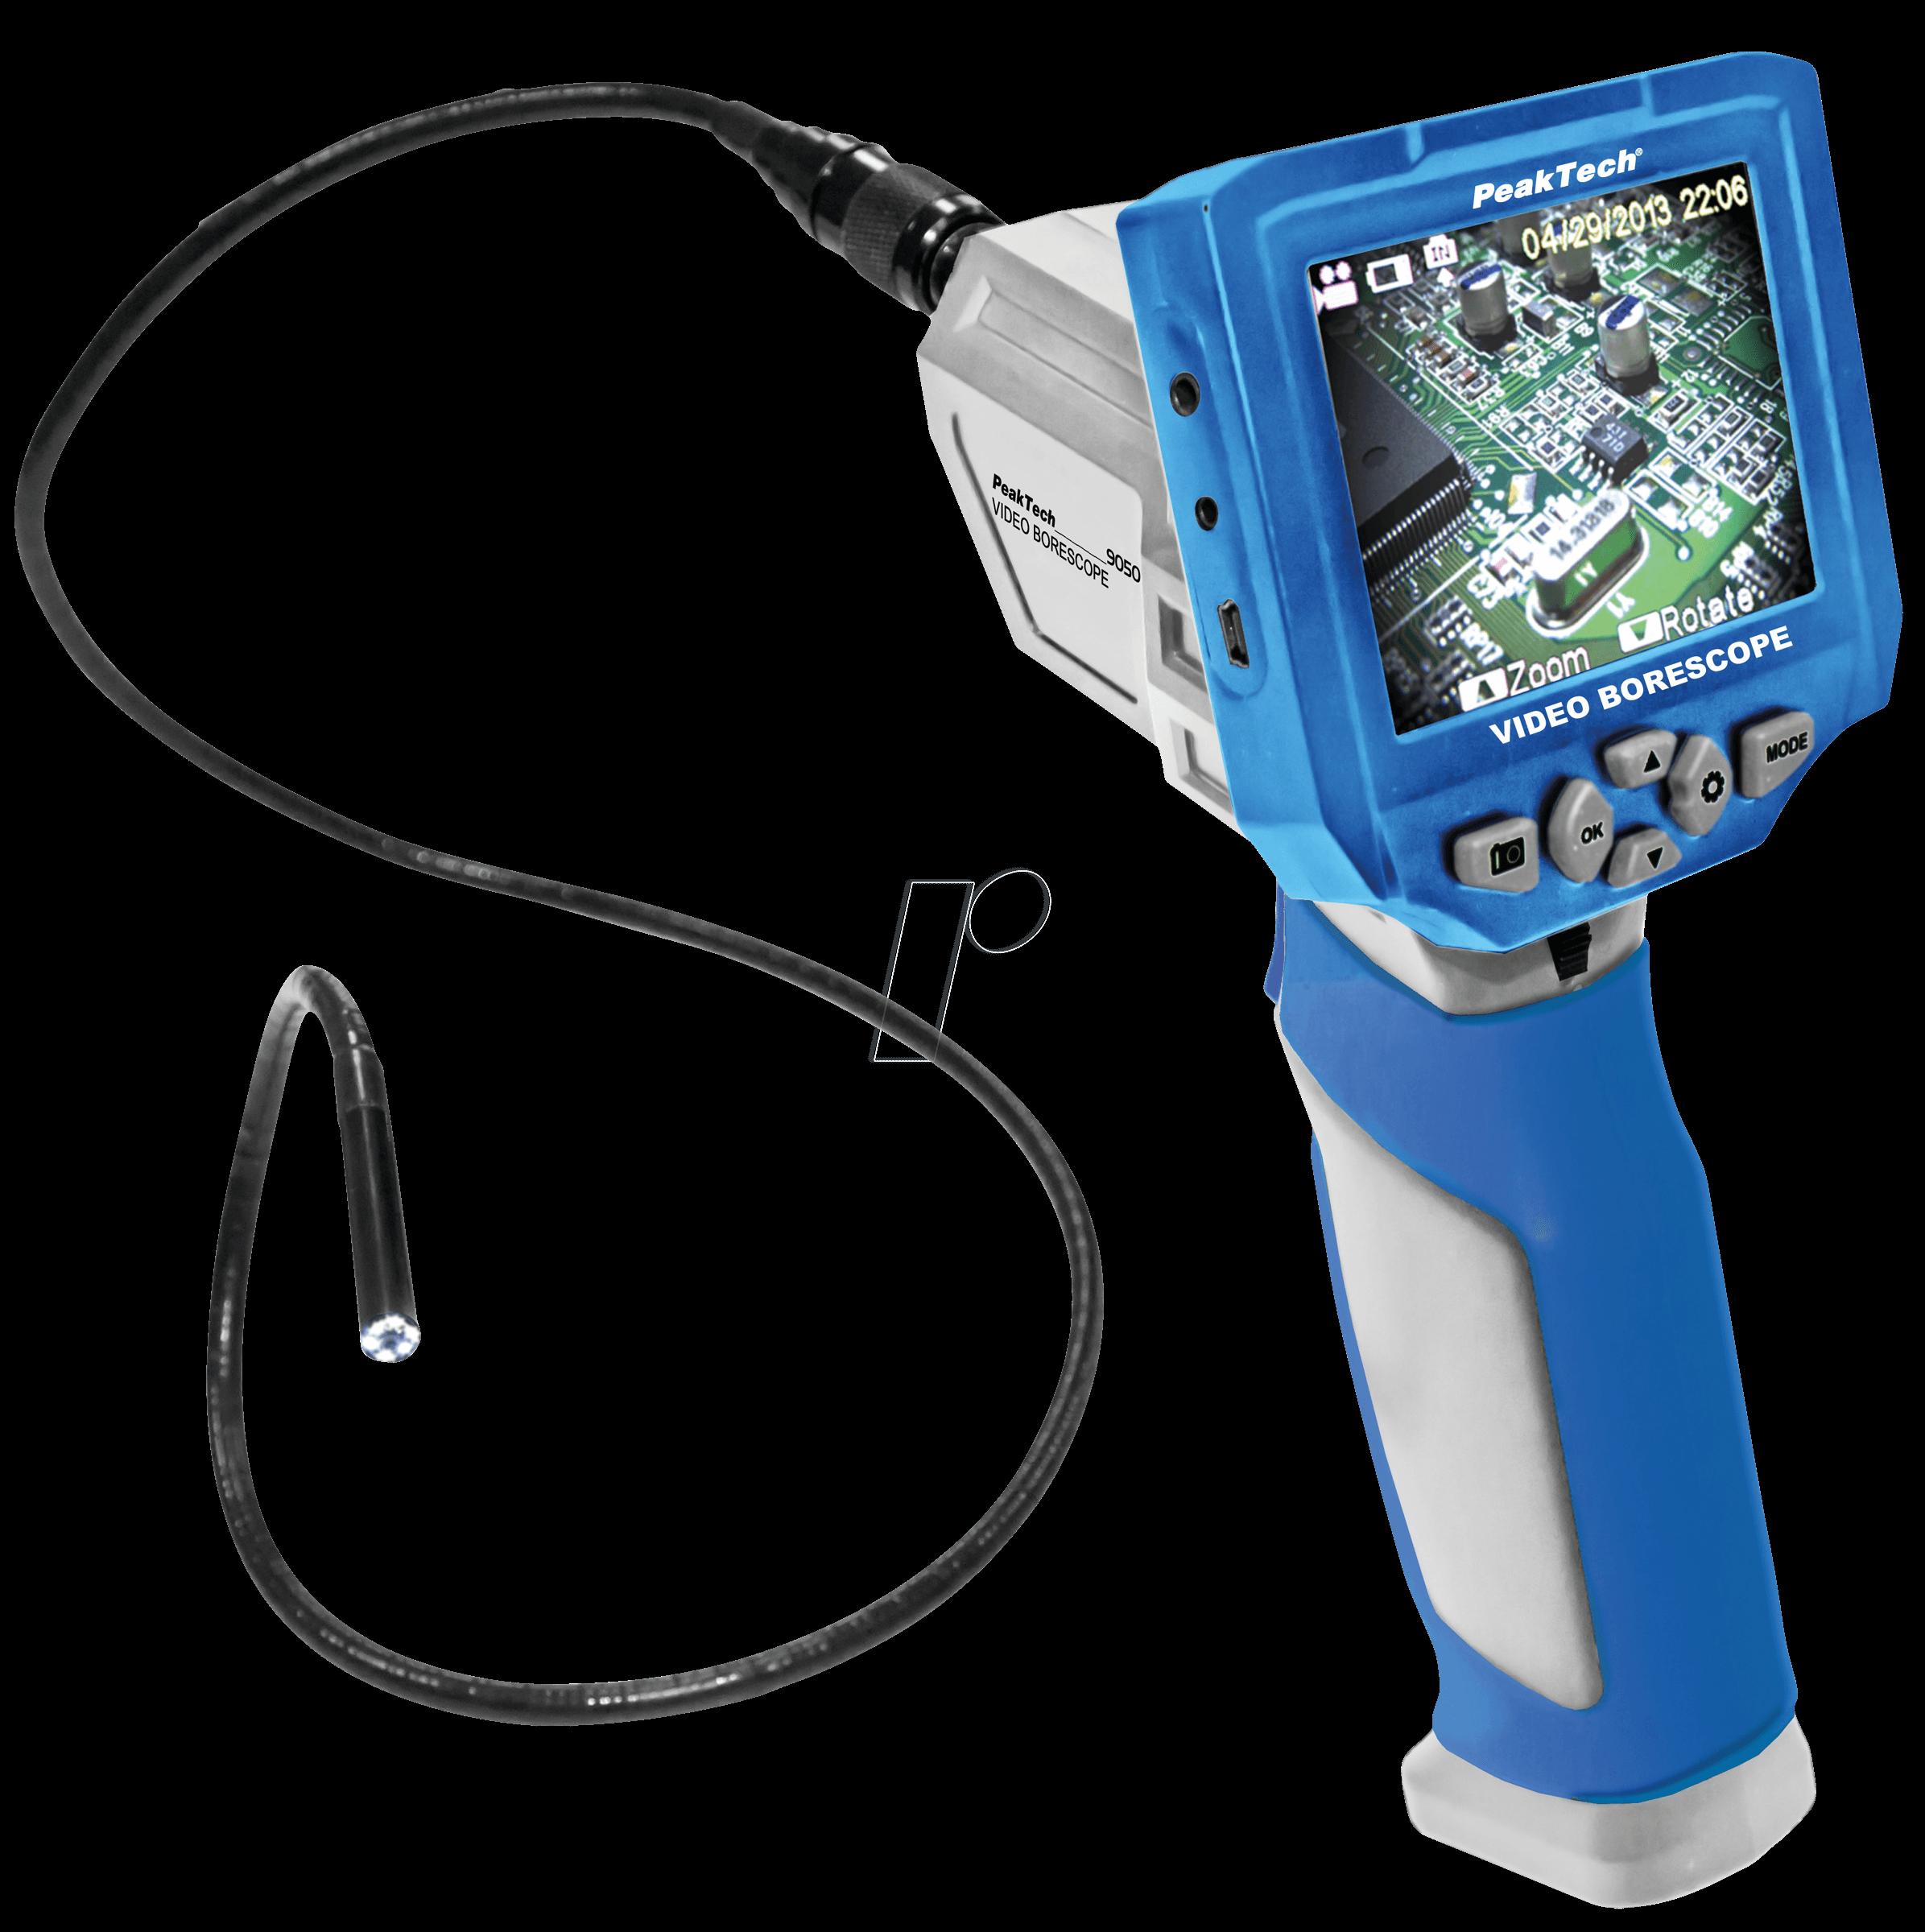 PEAKTECH 5600 - Digital Endoskop, Funk - Farbmonitor, USB/TV-Anschluss